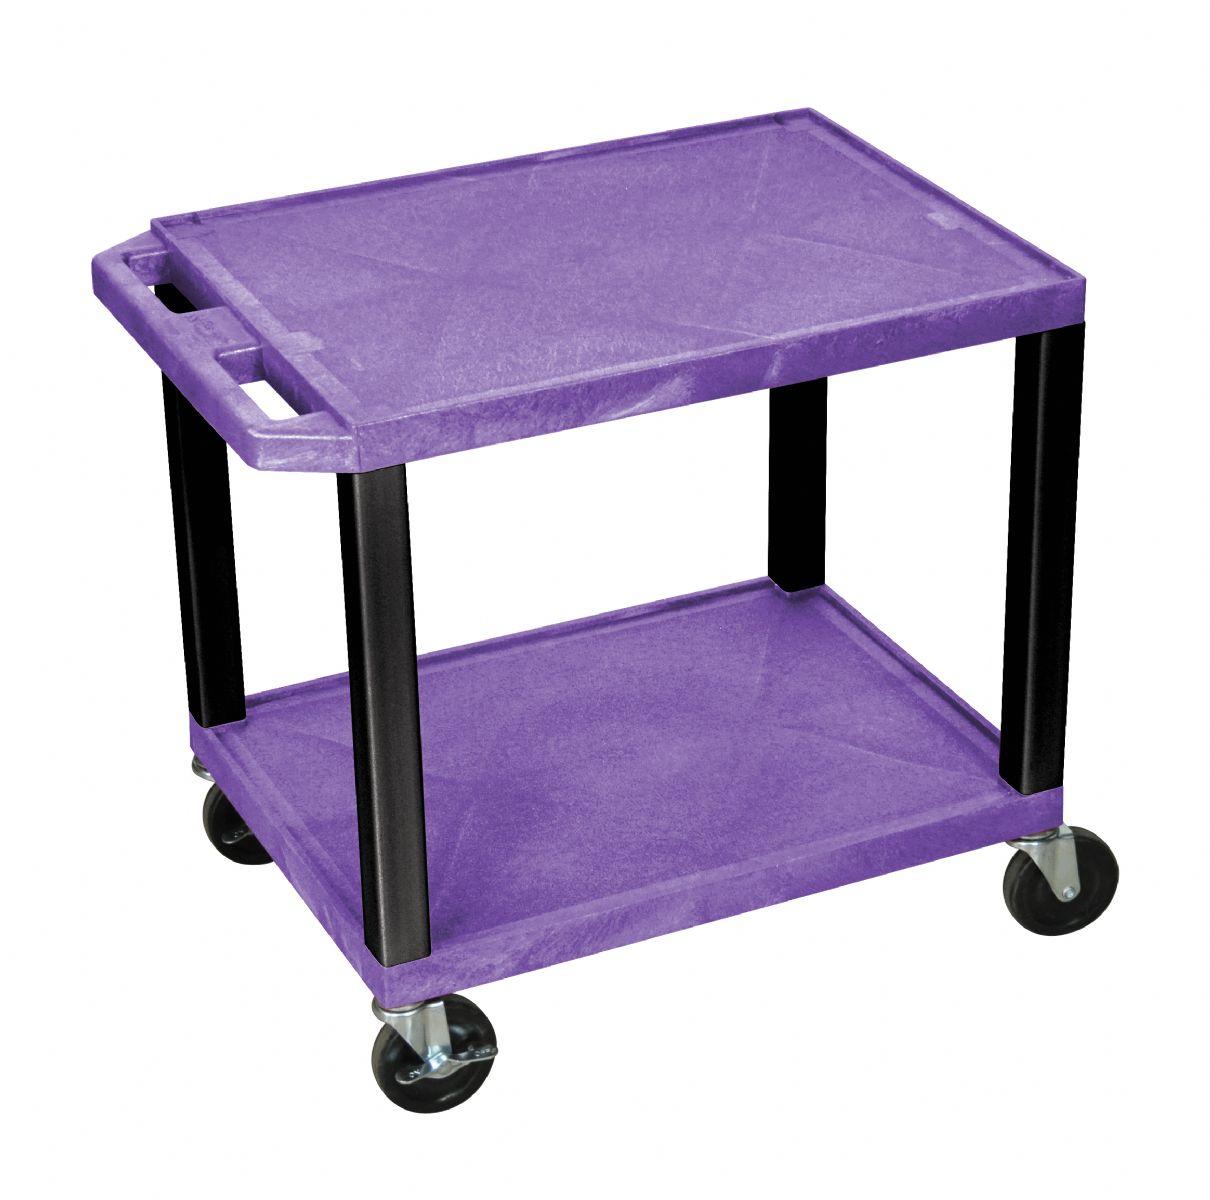 Luxor 26 Inch Two Shelf Av Push Cart Free Shipping